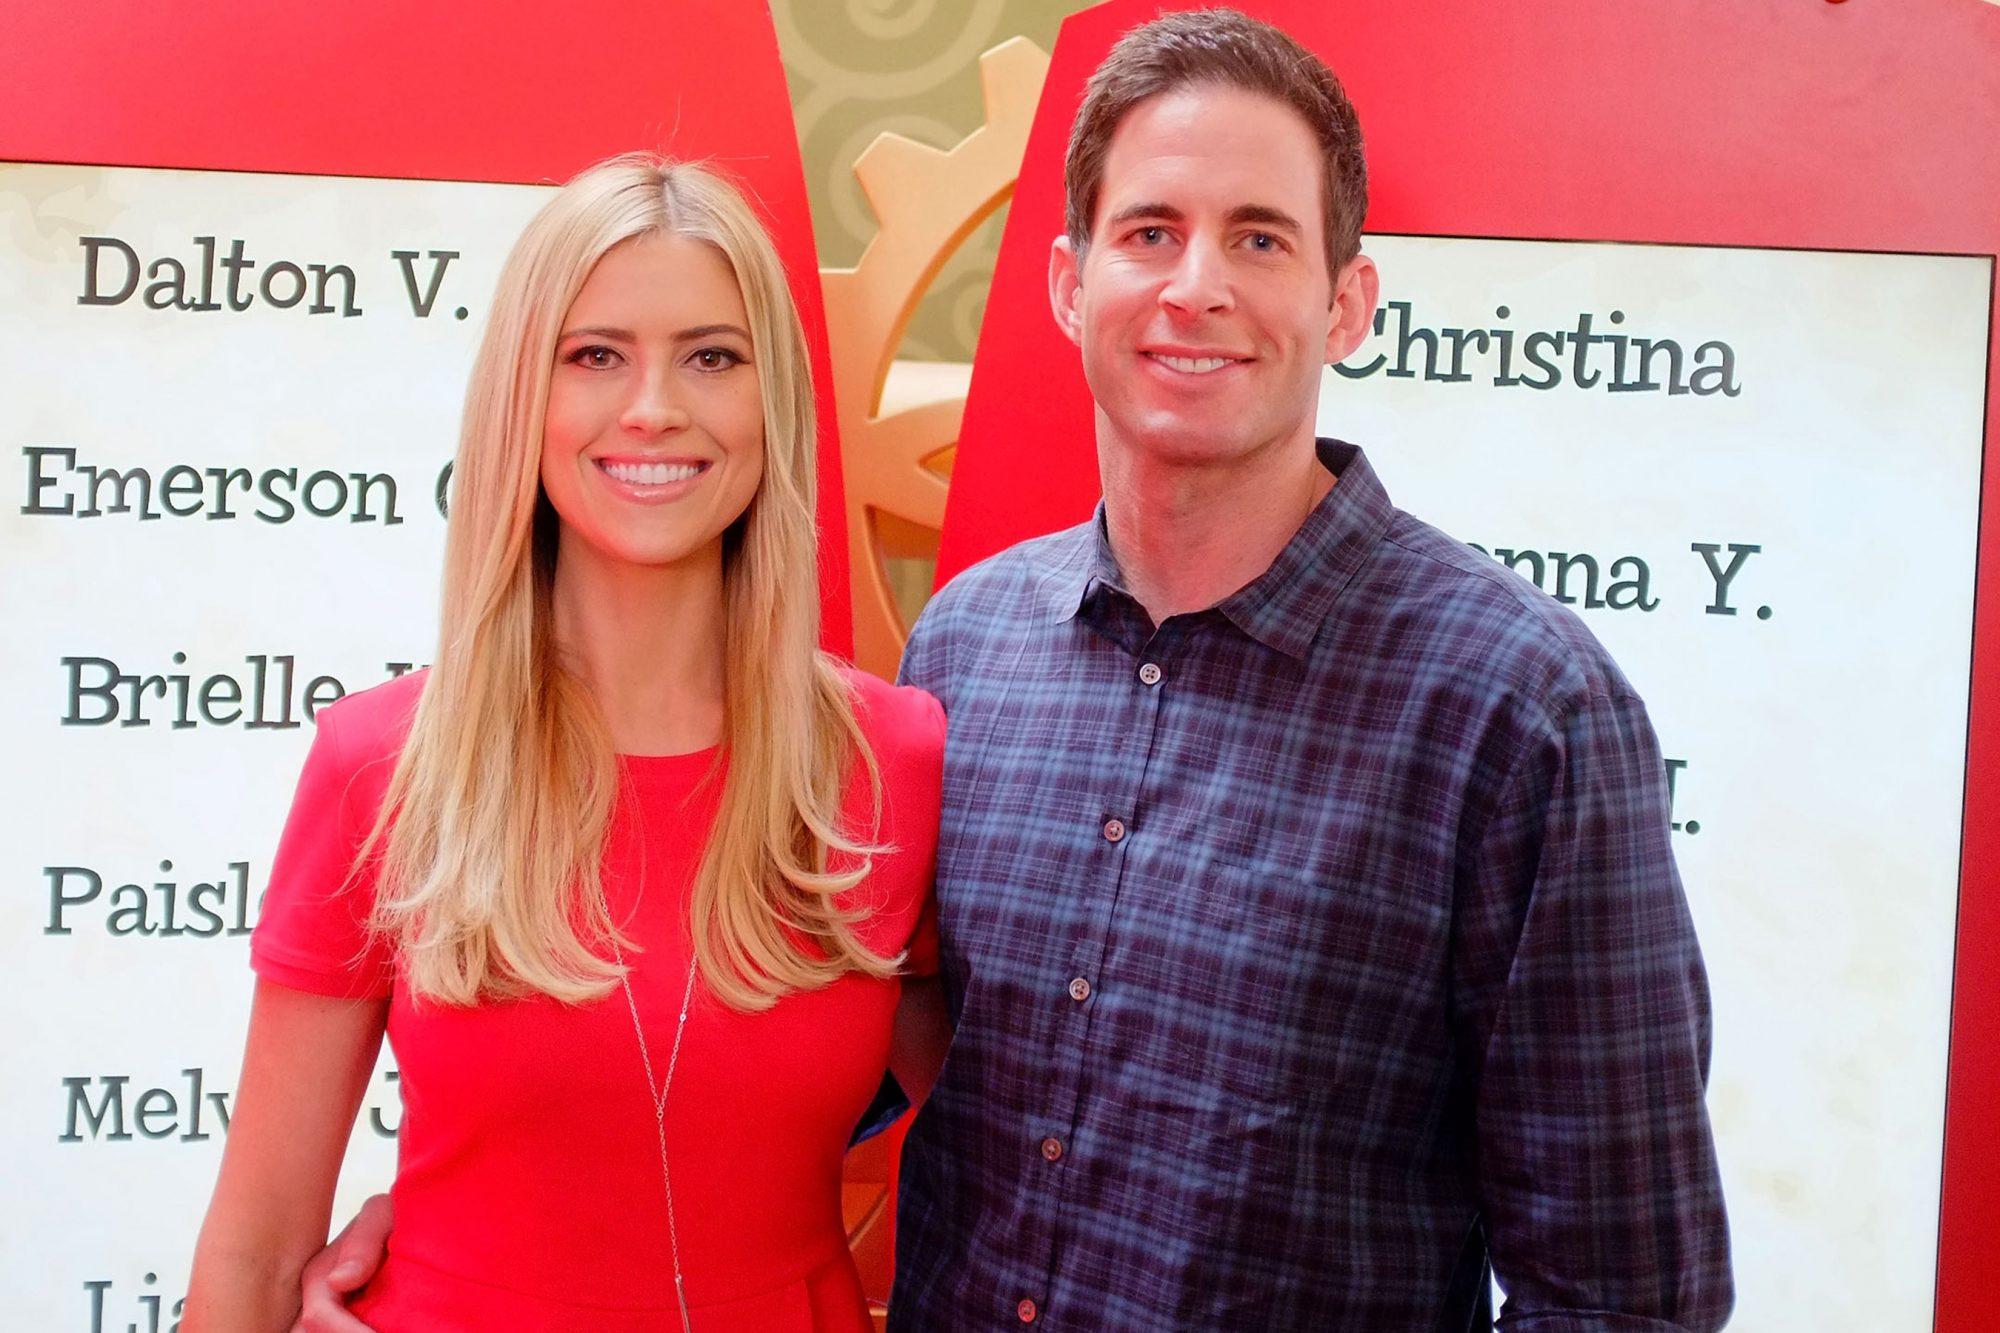 Tarek And Christina El Moussa, Hosts Of HGTV's Flip Or Flop, Visit Lakewood Center's Santa HQ